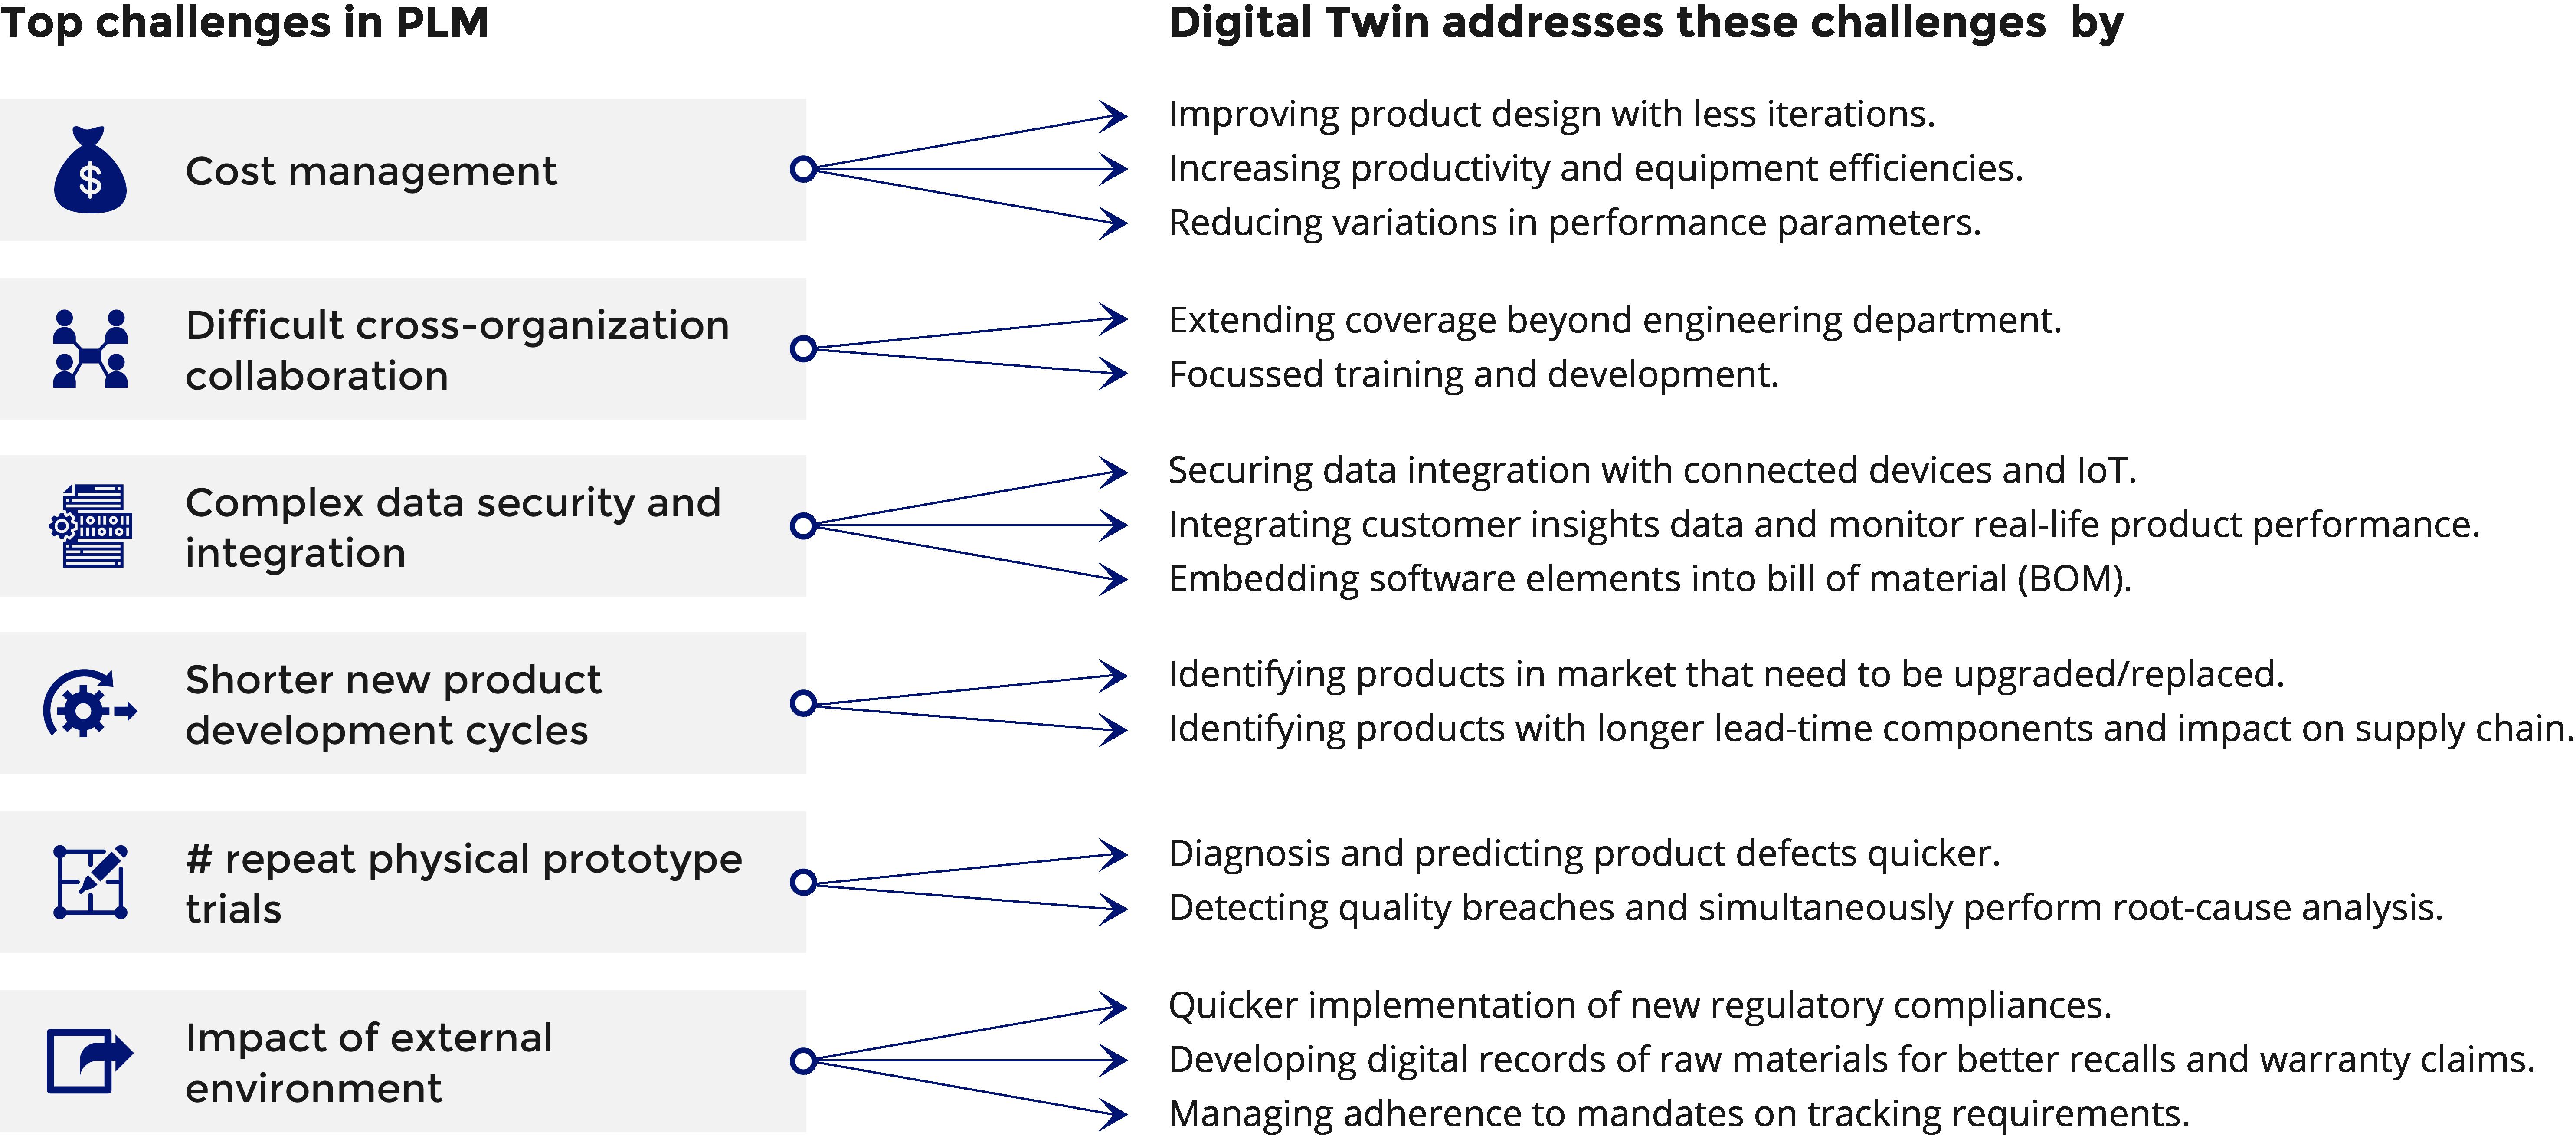 Top Challenges, Diagram, Incisiv